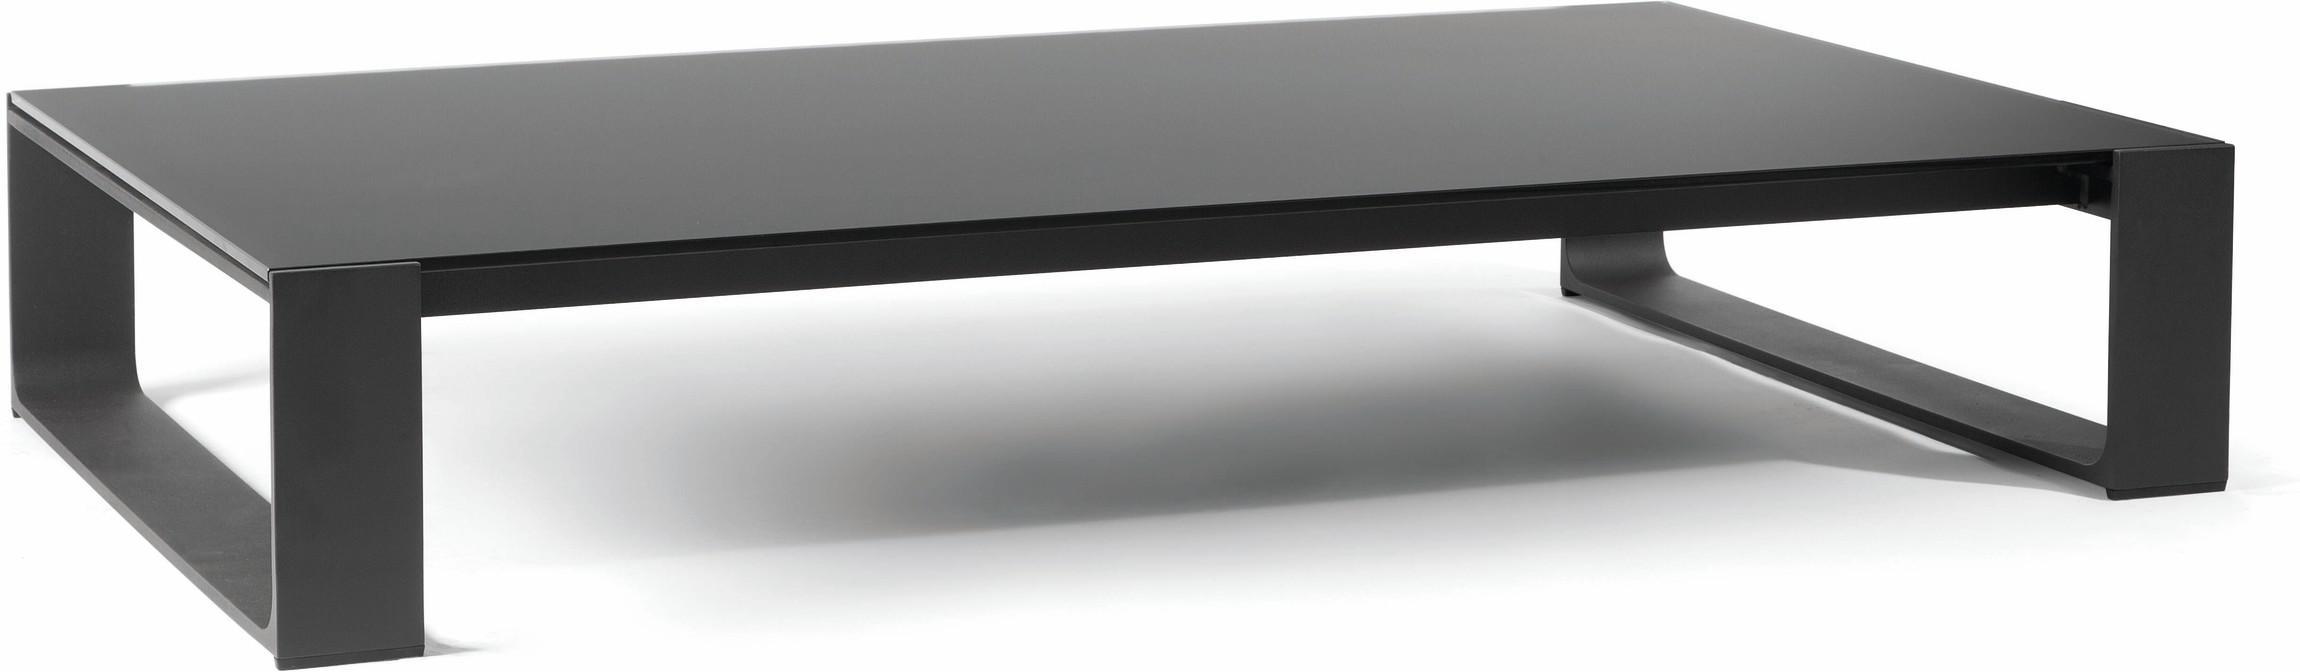 Prato coffee table - lava - GLB 150